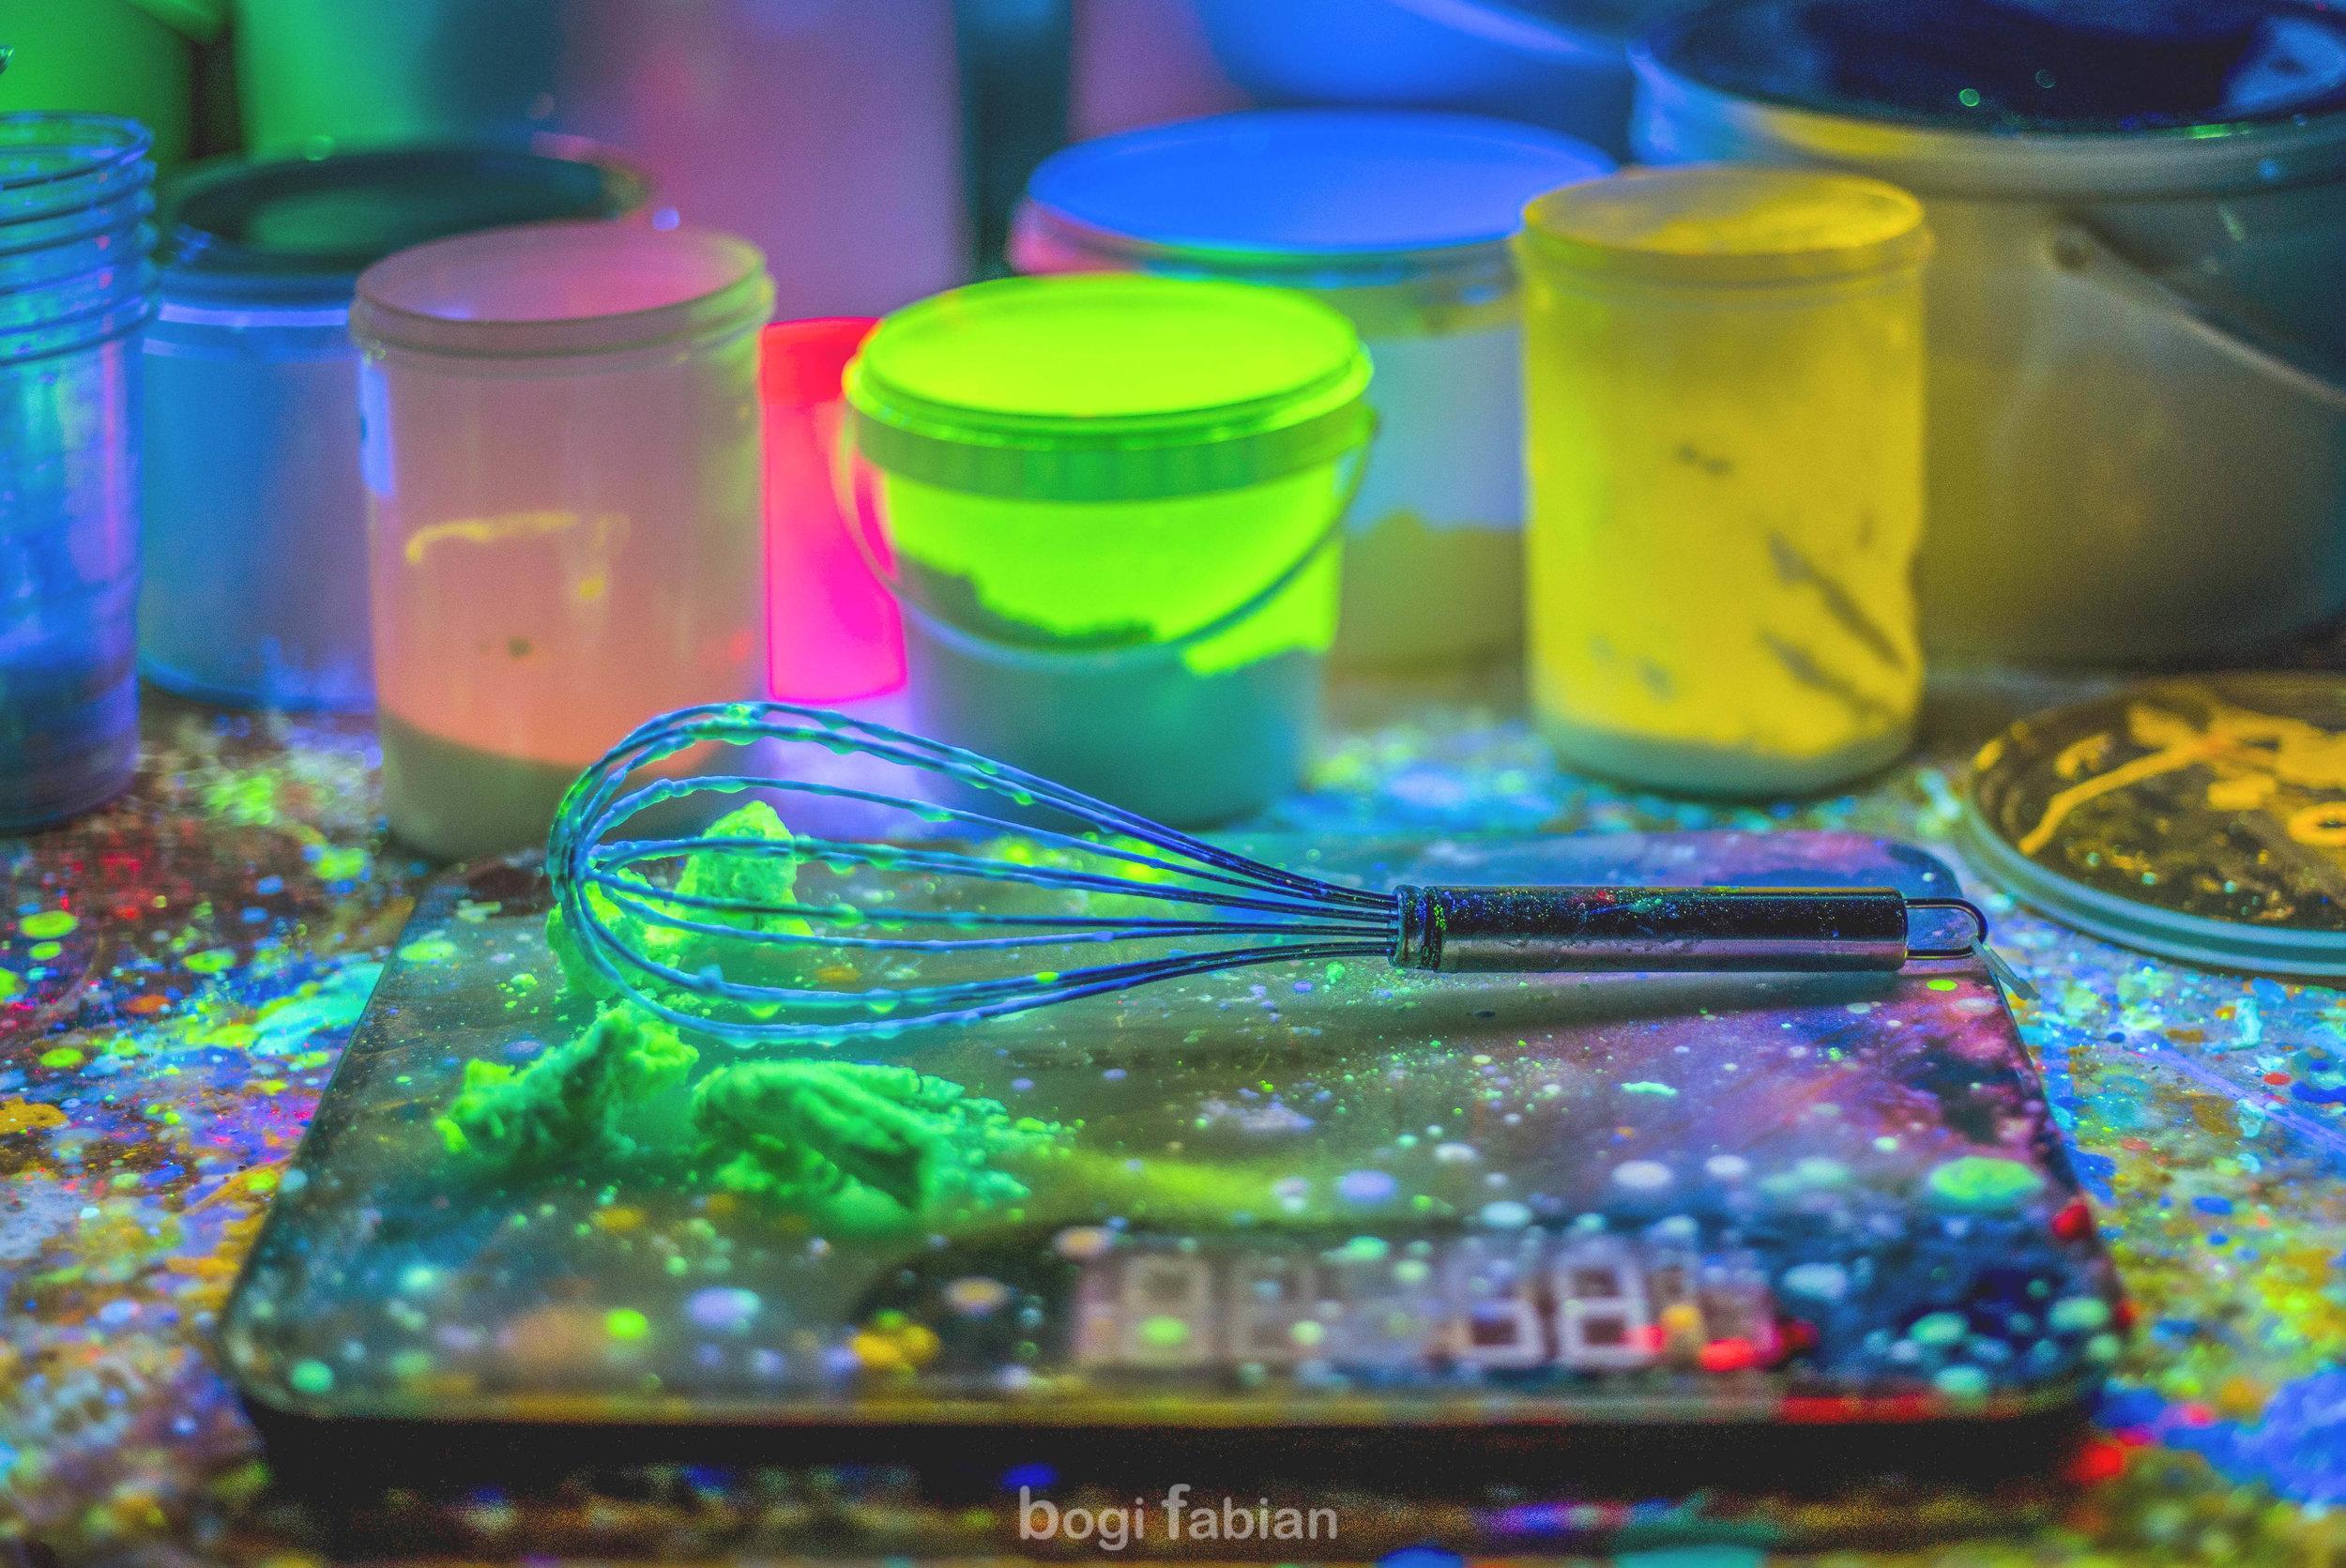 Bogi Fabian Pottery wheel Tomi Bojnec How to have fun on the potter's wheel ft. Ultraviolet Light  blacklight fluorescent magic